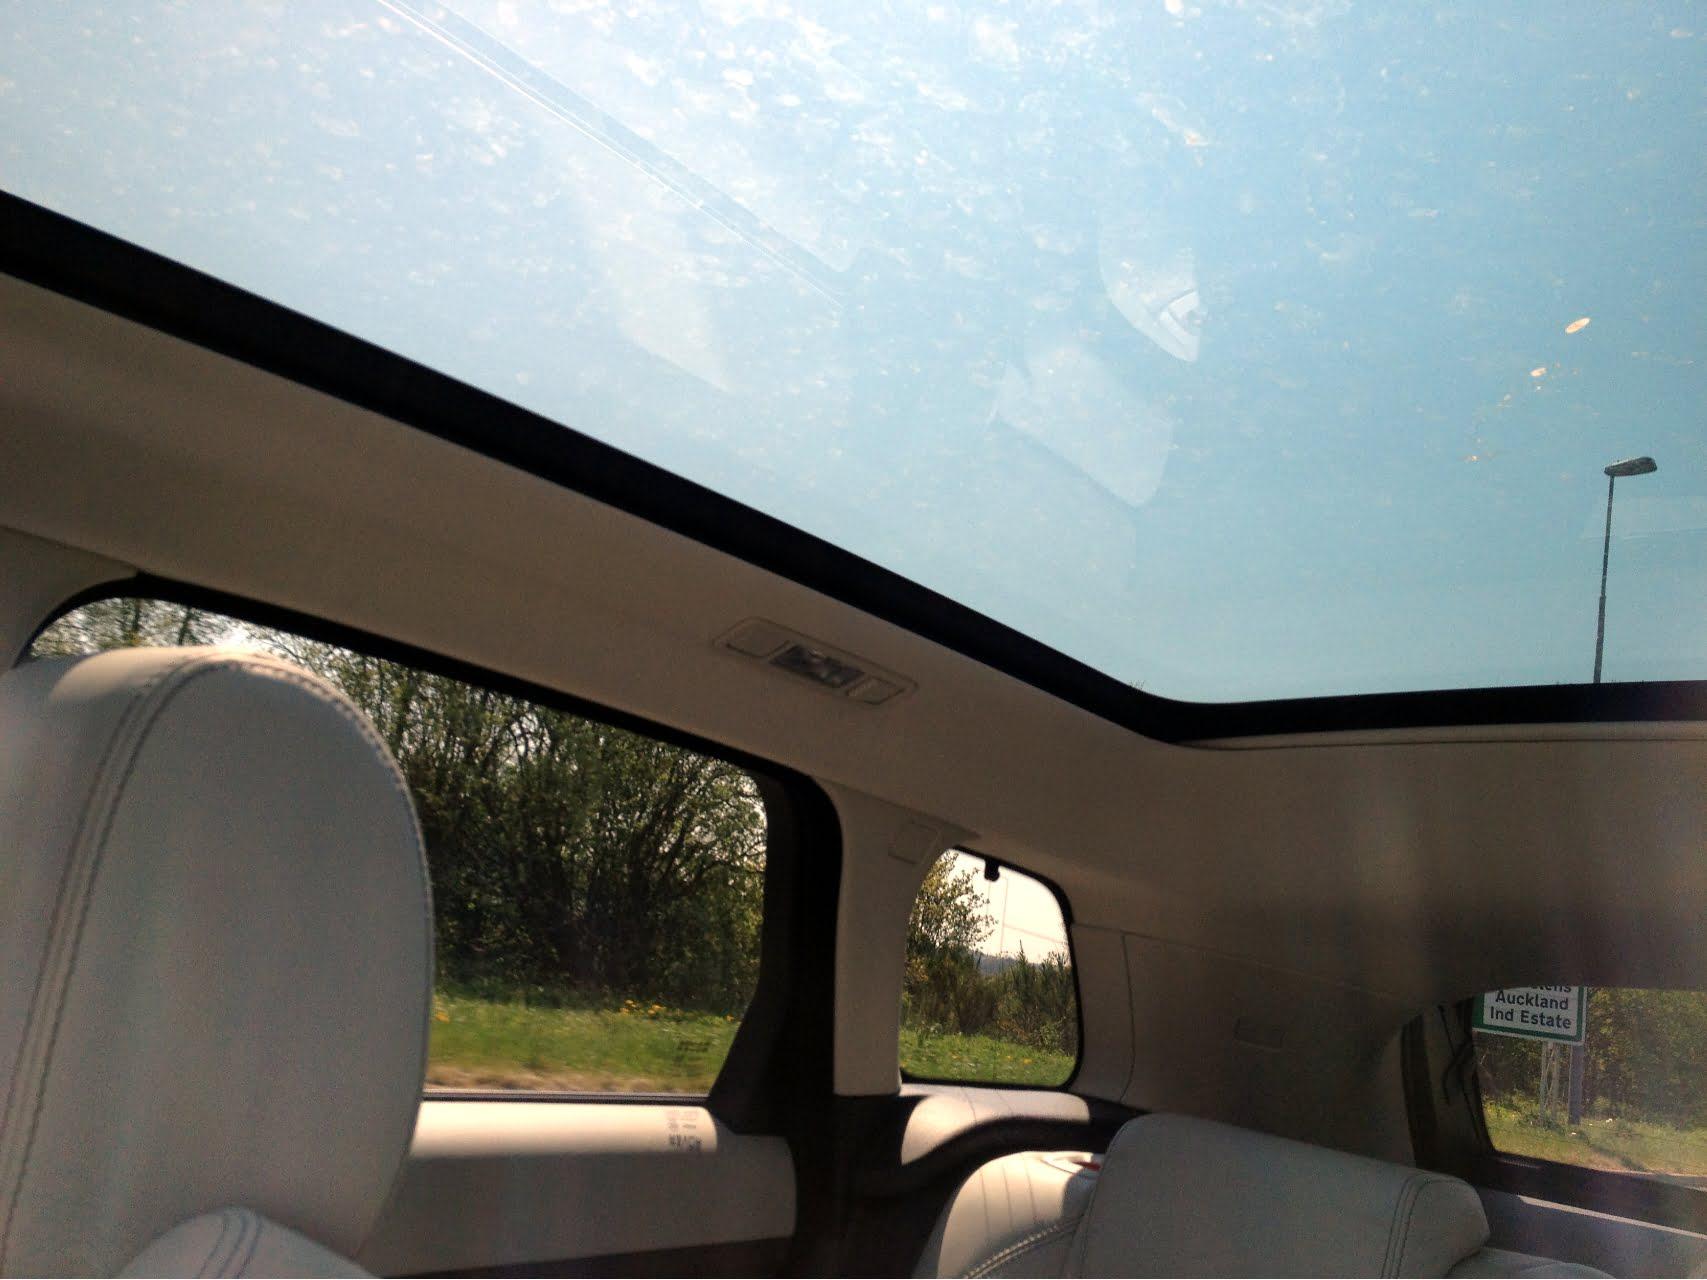 Range Rover Evoque Glass Roof